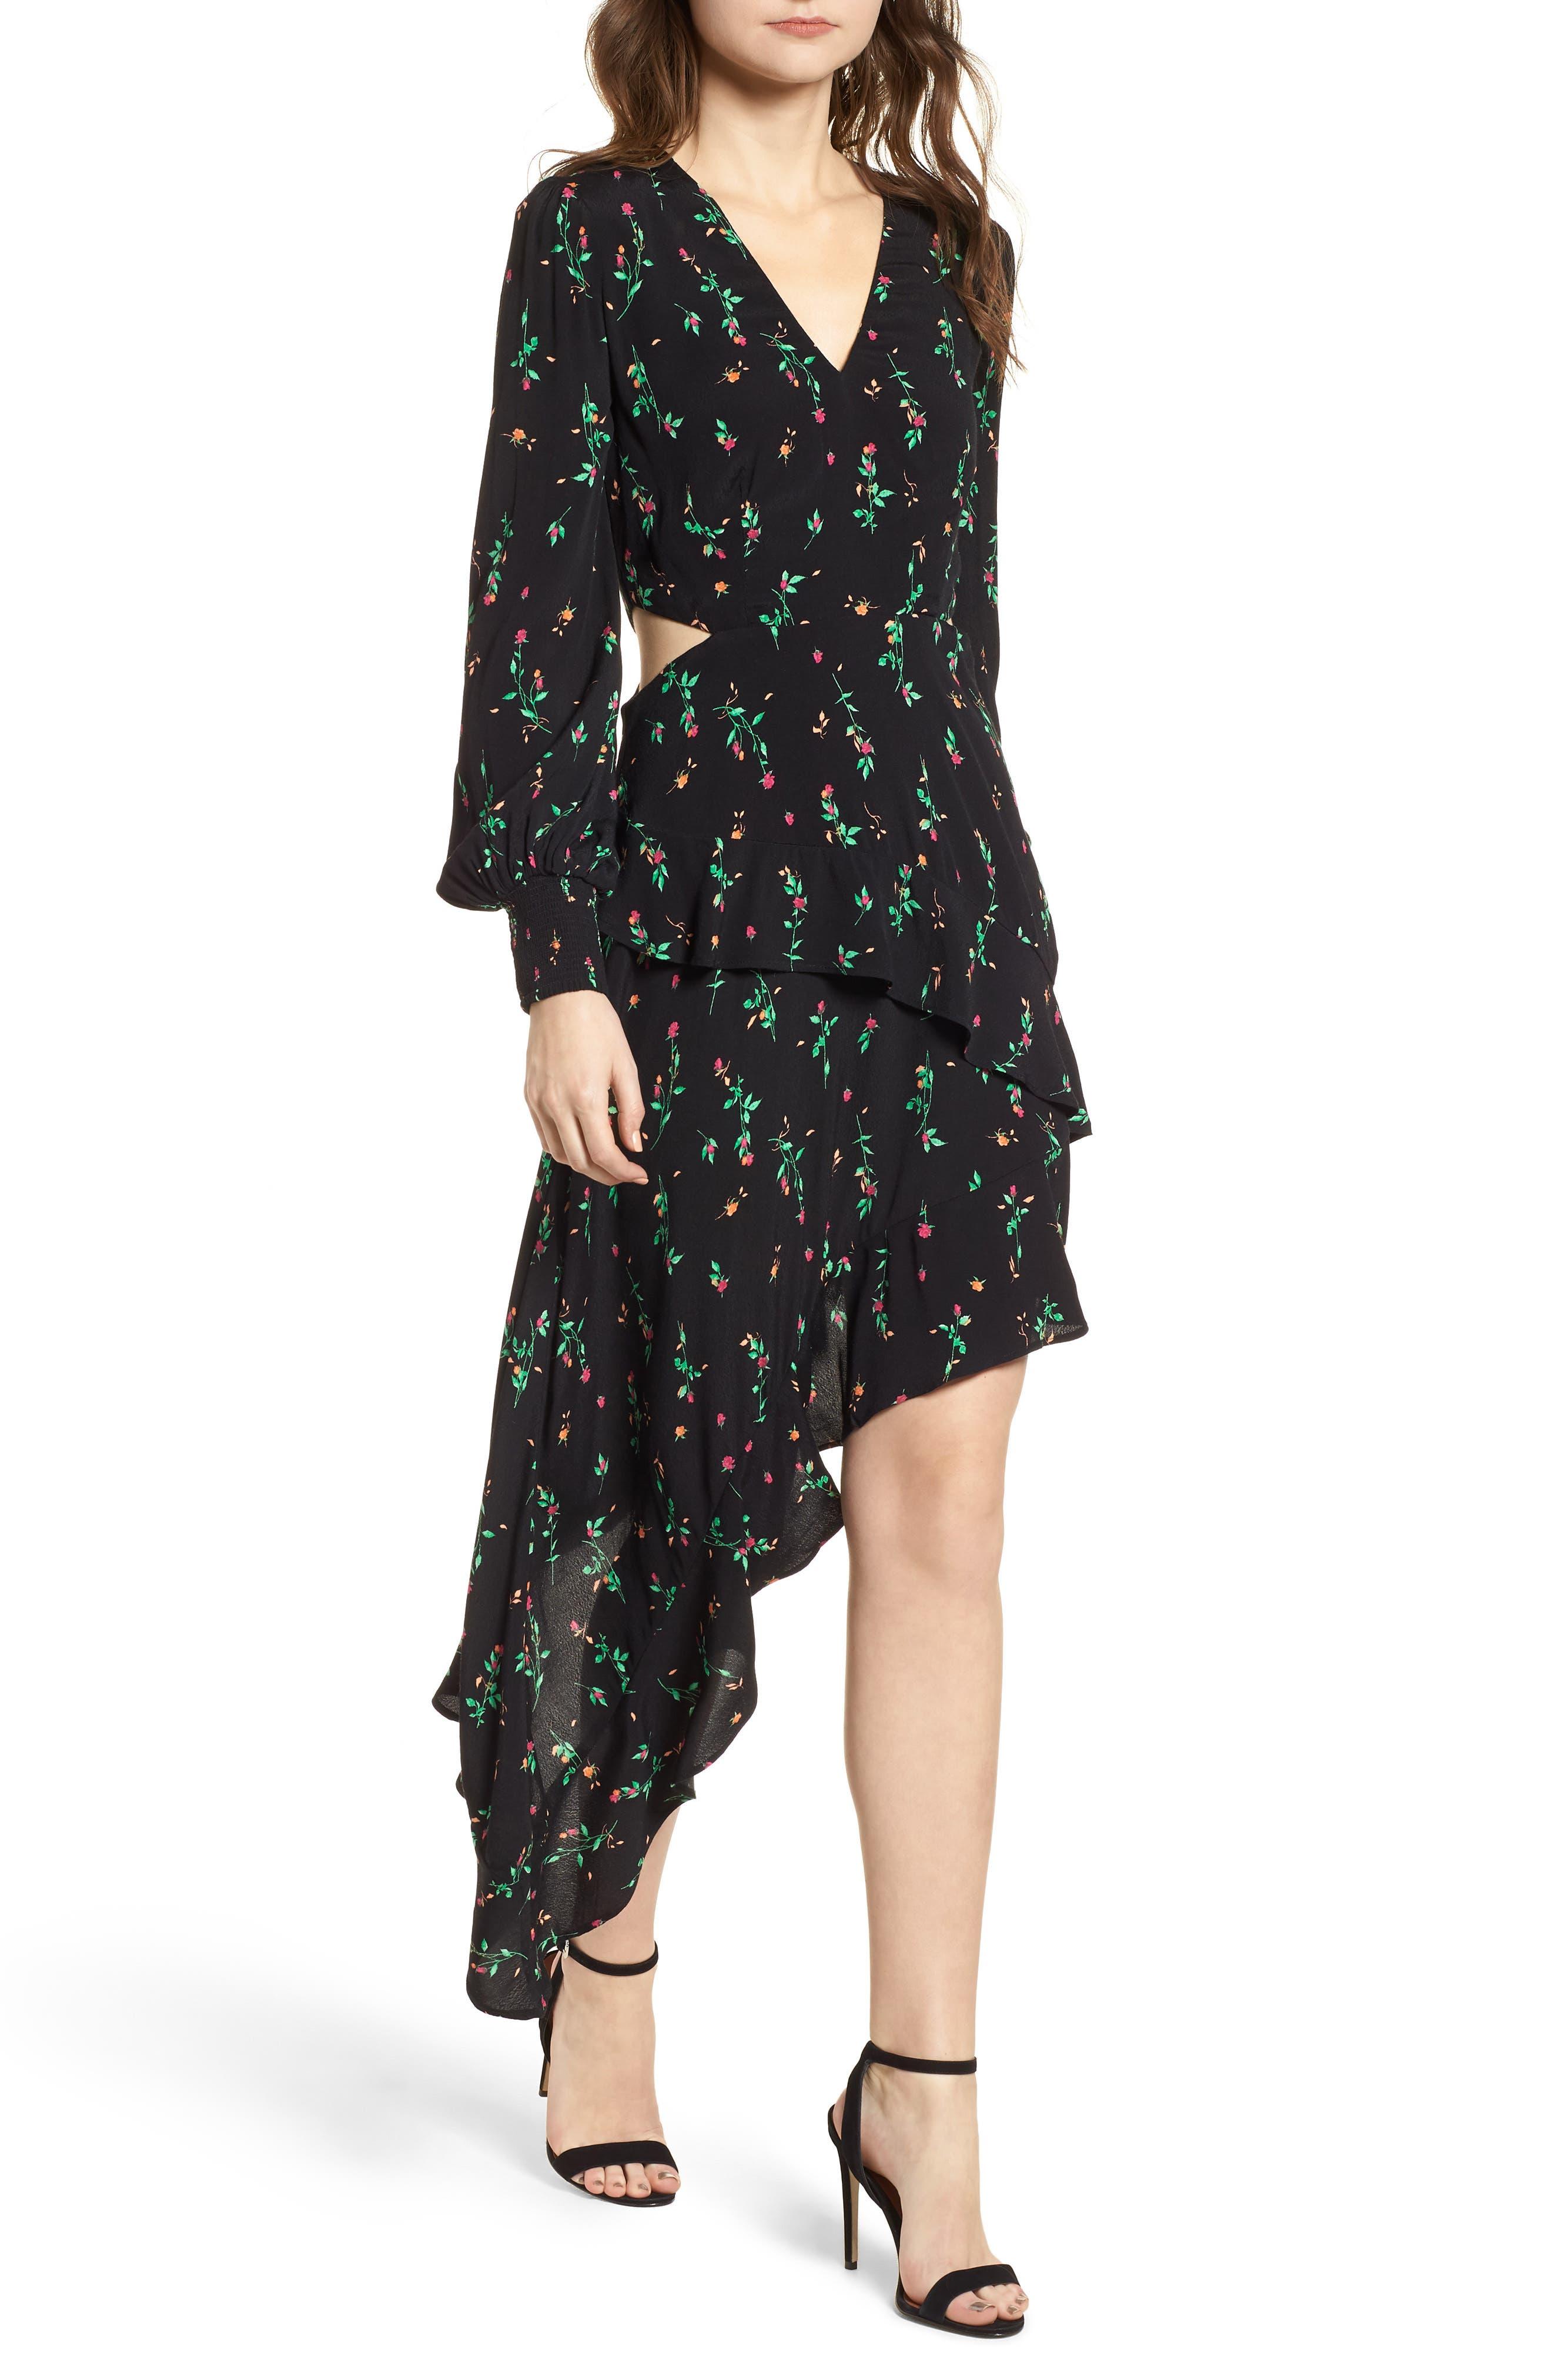 Mabel Cutout Asymmetrical Dress,                         Main,                         color, Noir Rose Ditsy